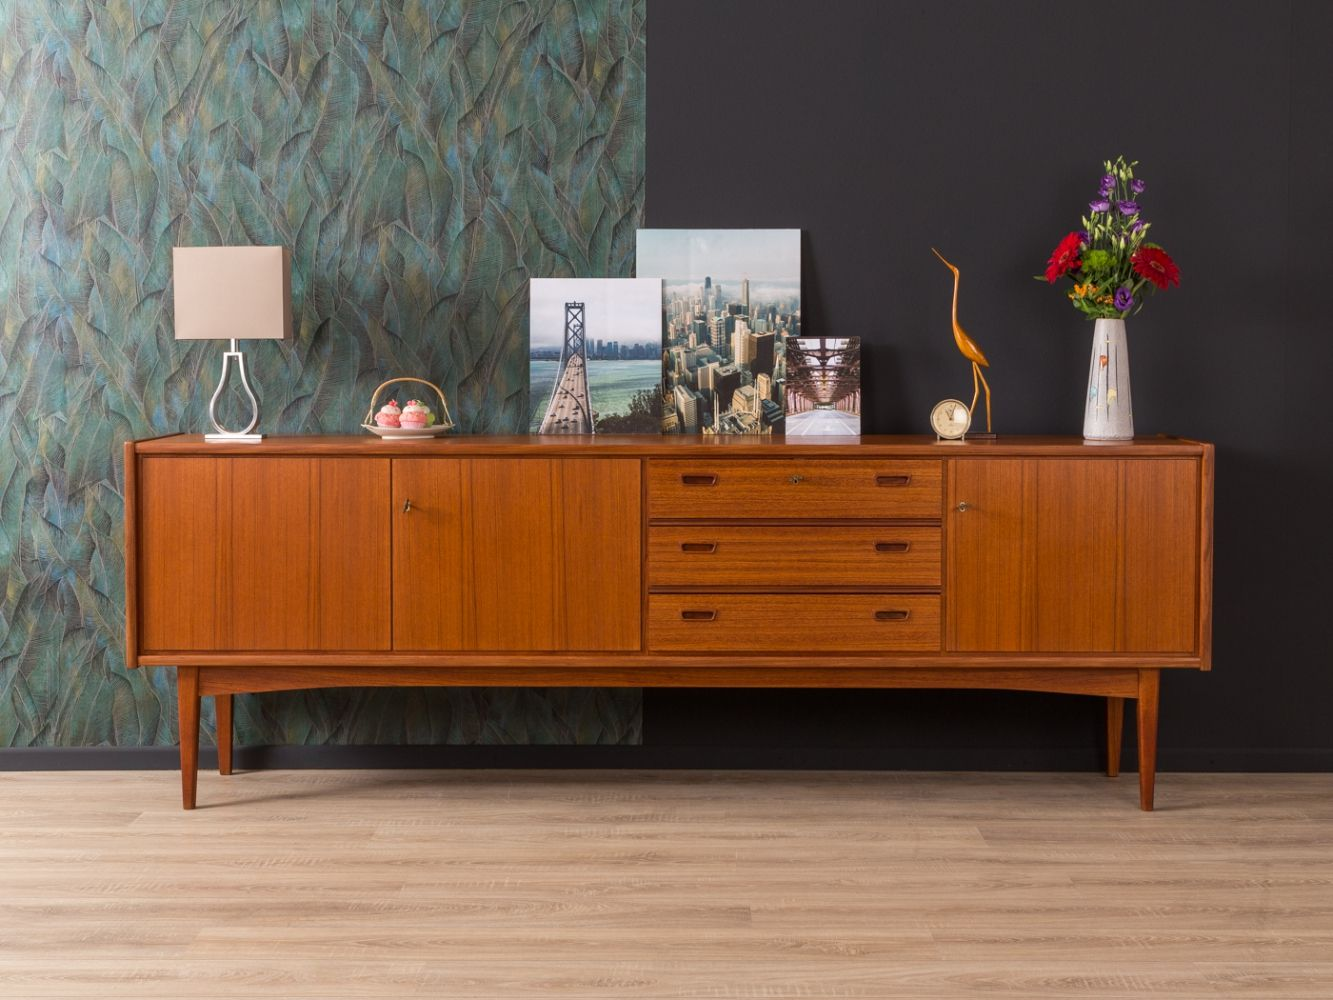 german sideboard by bartels from the 1960s vintage design storage rh pinterest com